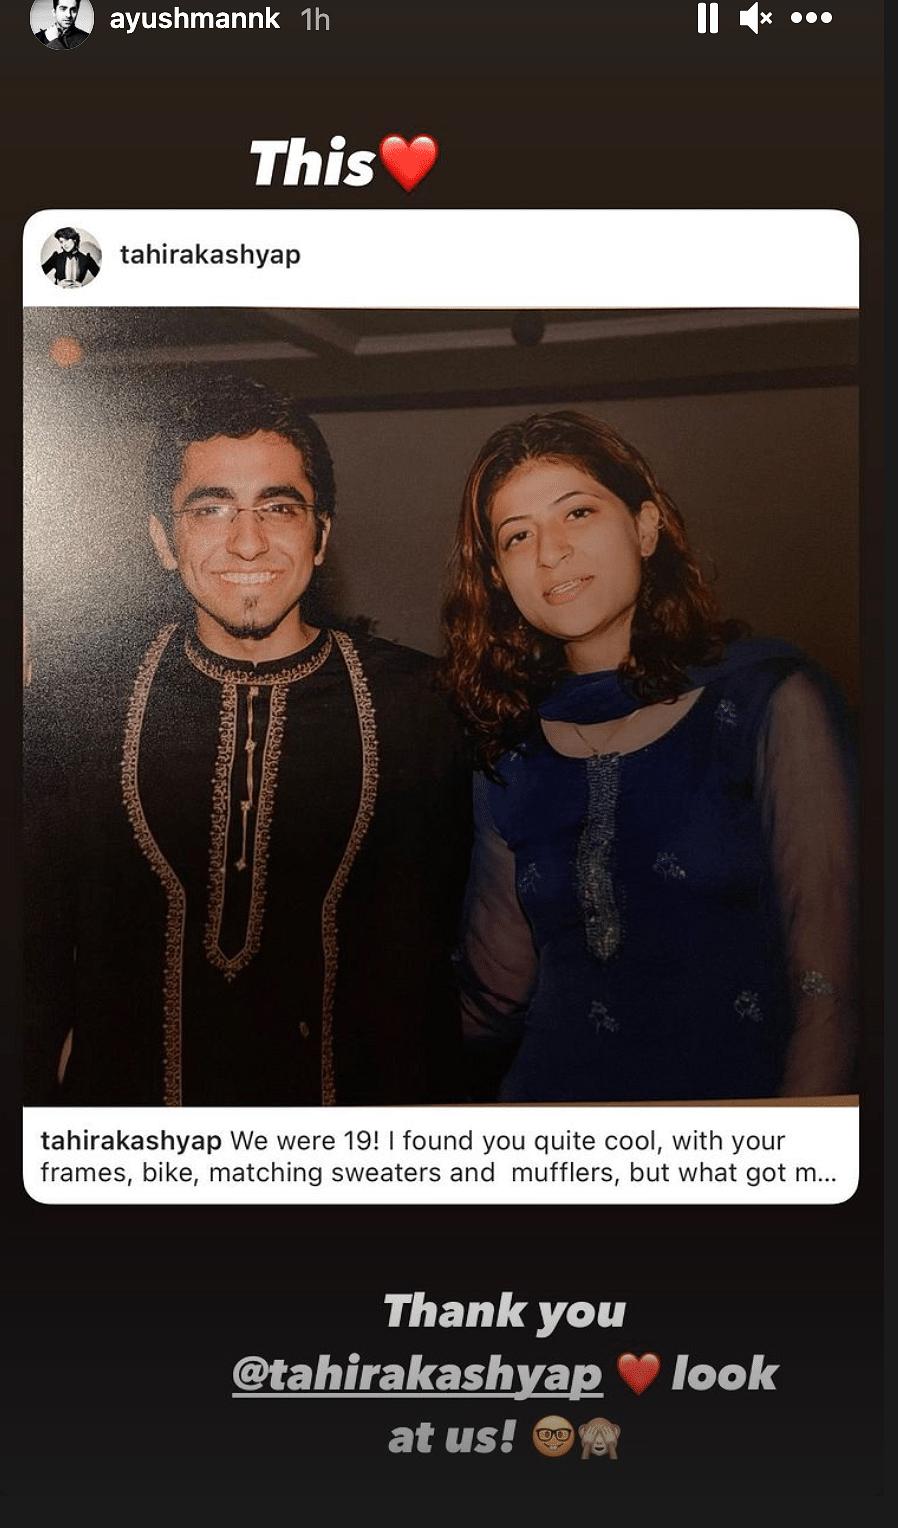 On Ayushmann Khurrana's B'day Tahira Kashyap Speaks About Their Love Story